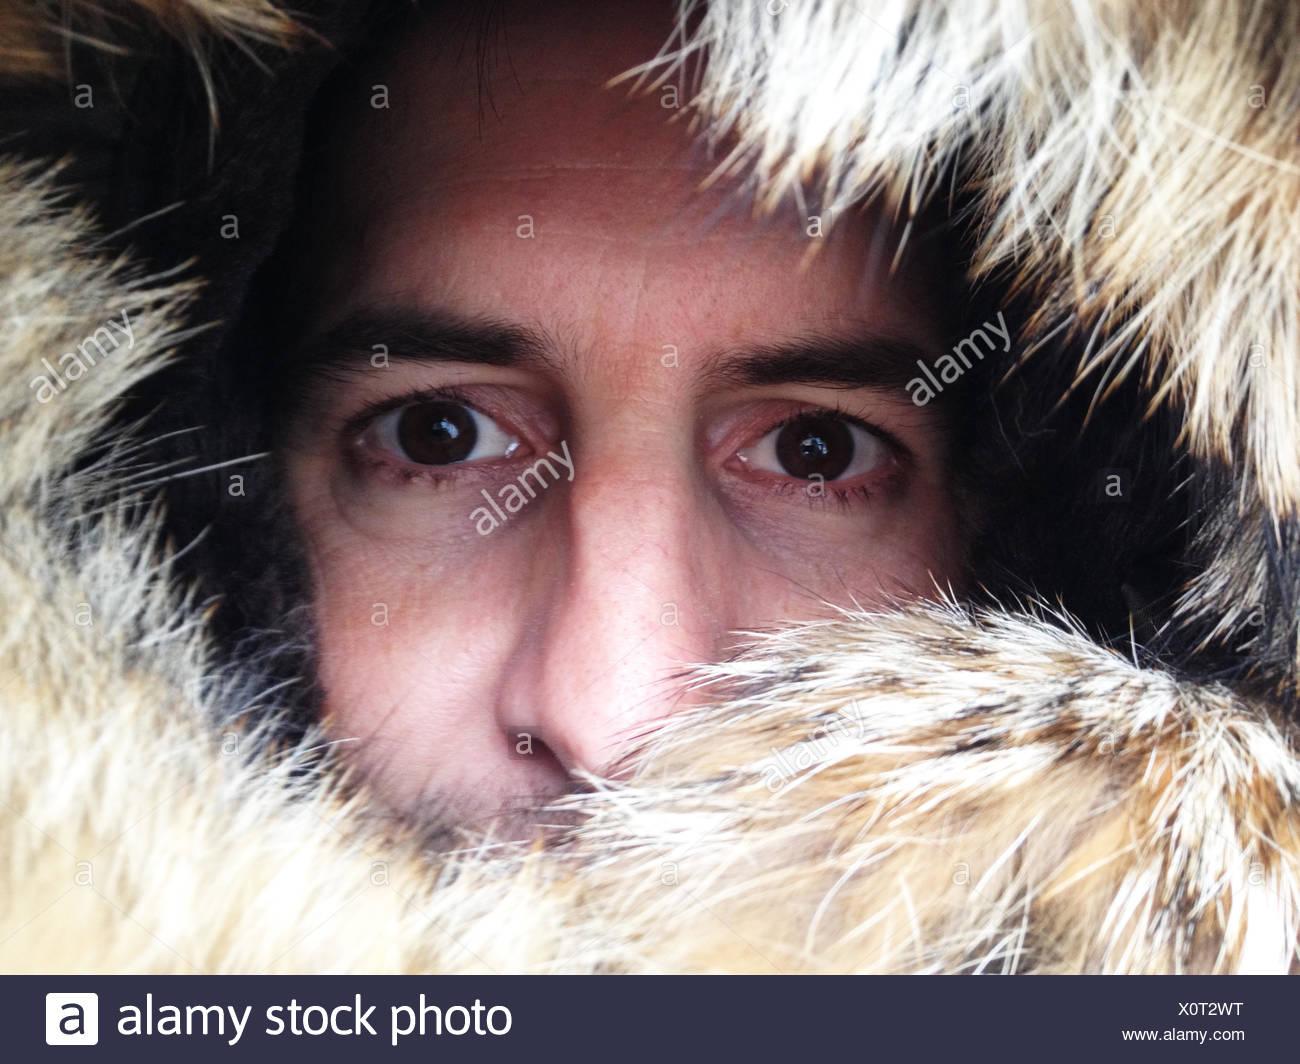 Retrato del hombre mirando a través de capucha forrada de pieles Imagen De Stock